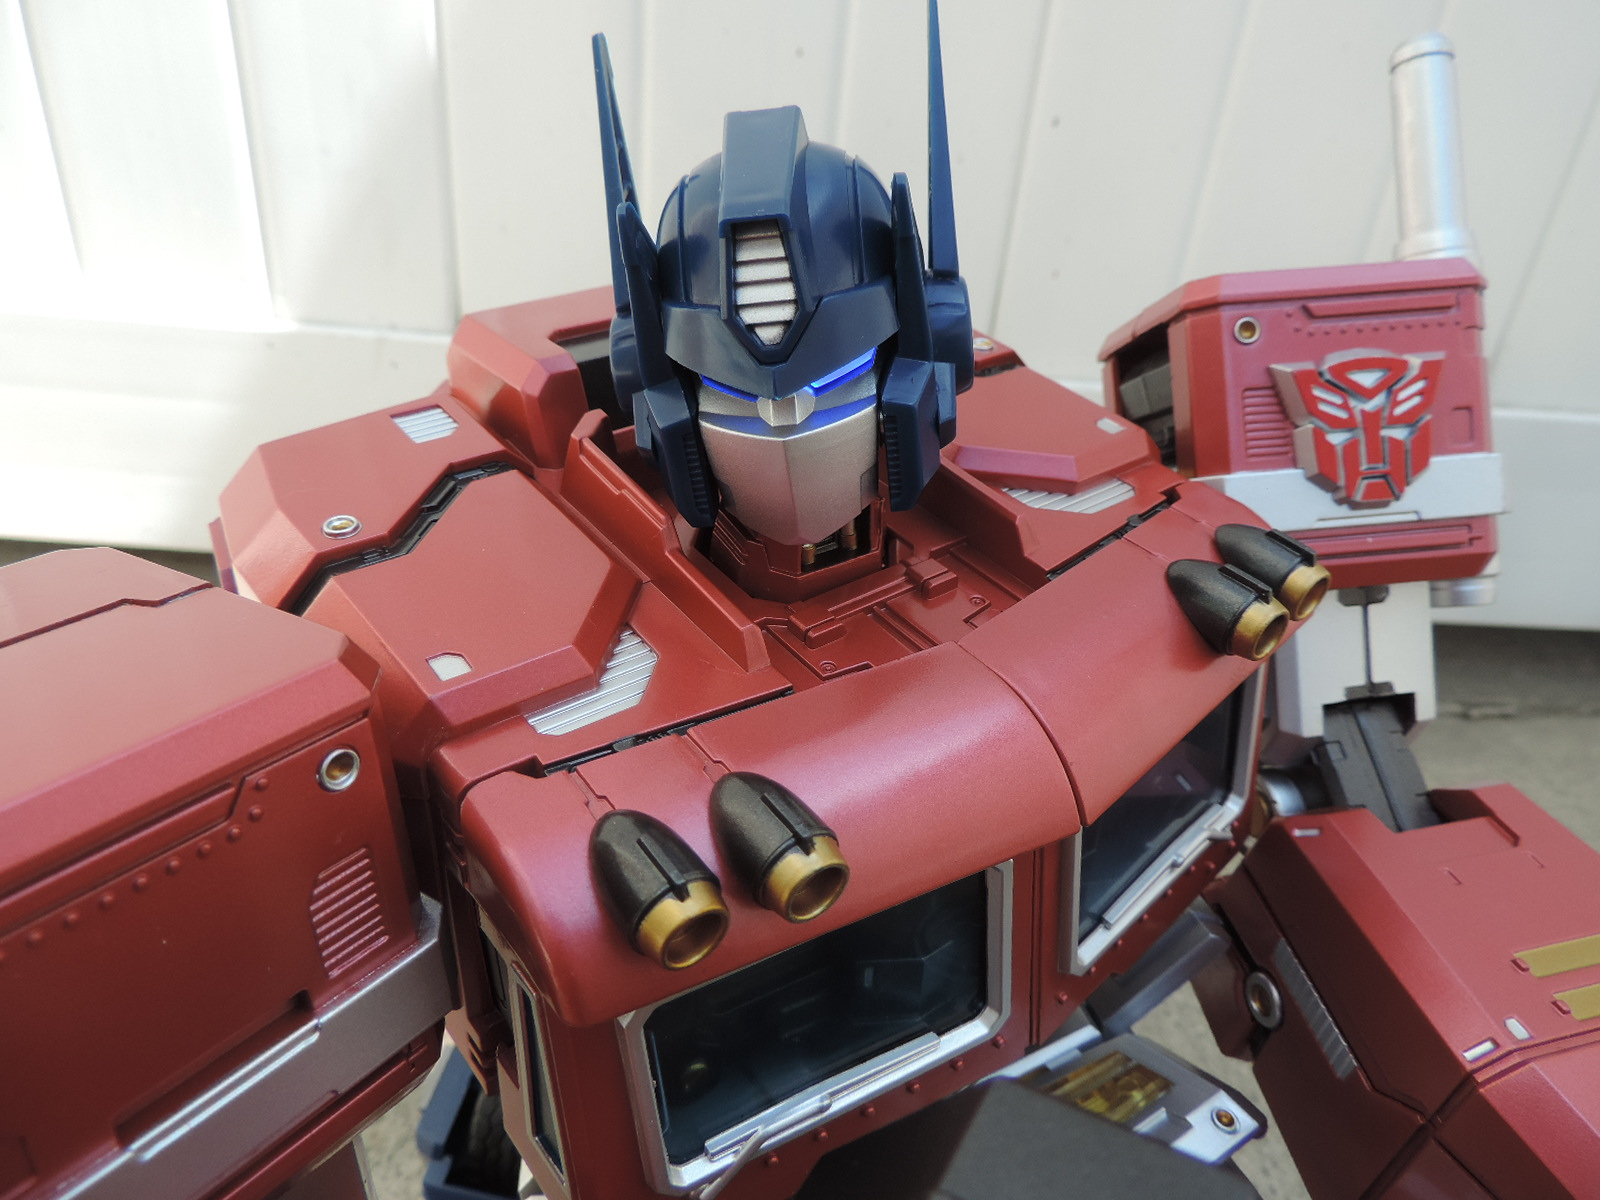 toy alliance: mega action series 01 optimus prime | the fwoosh